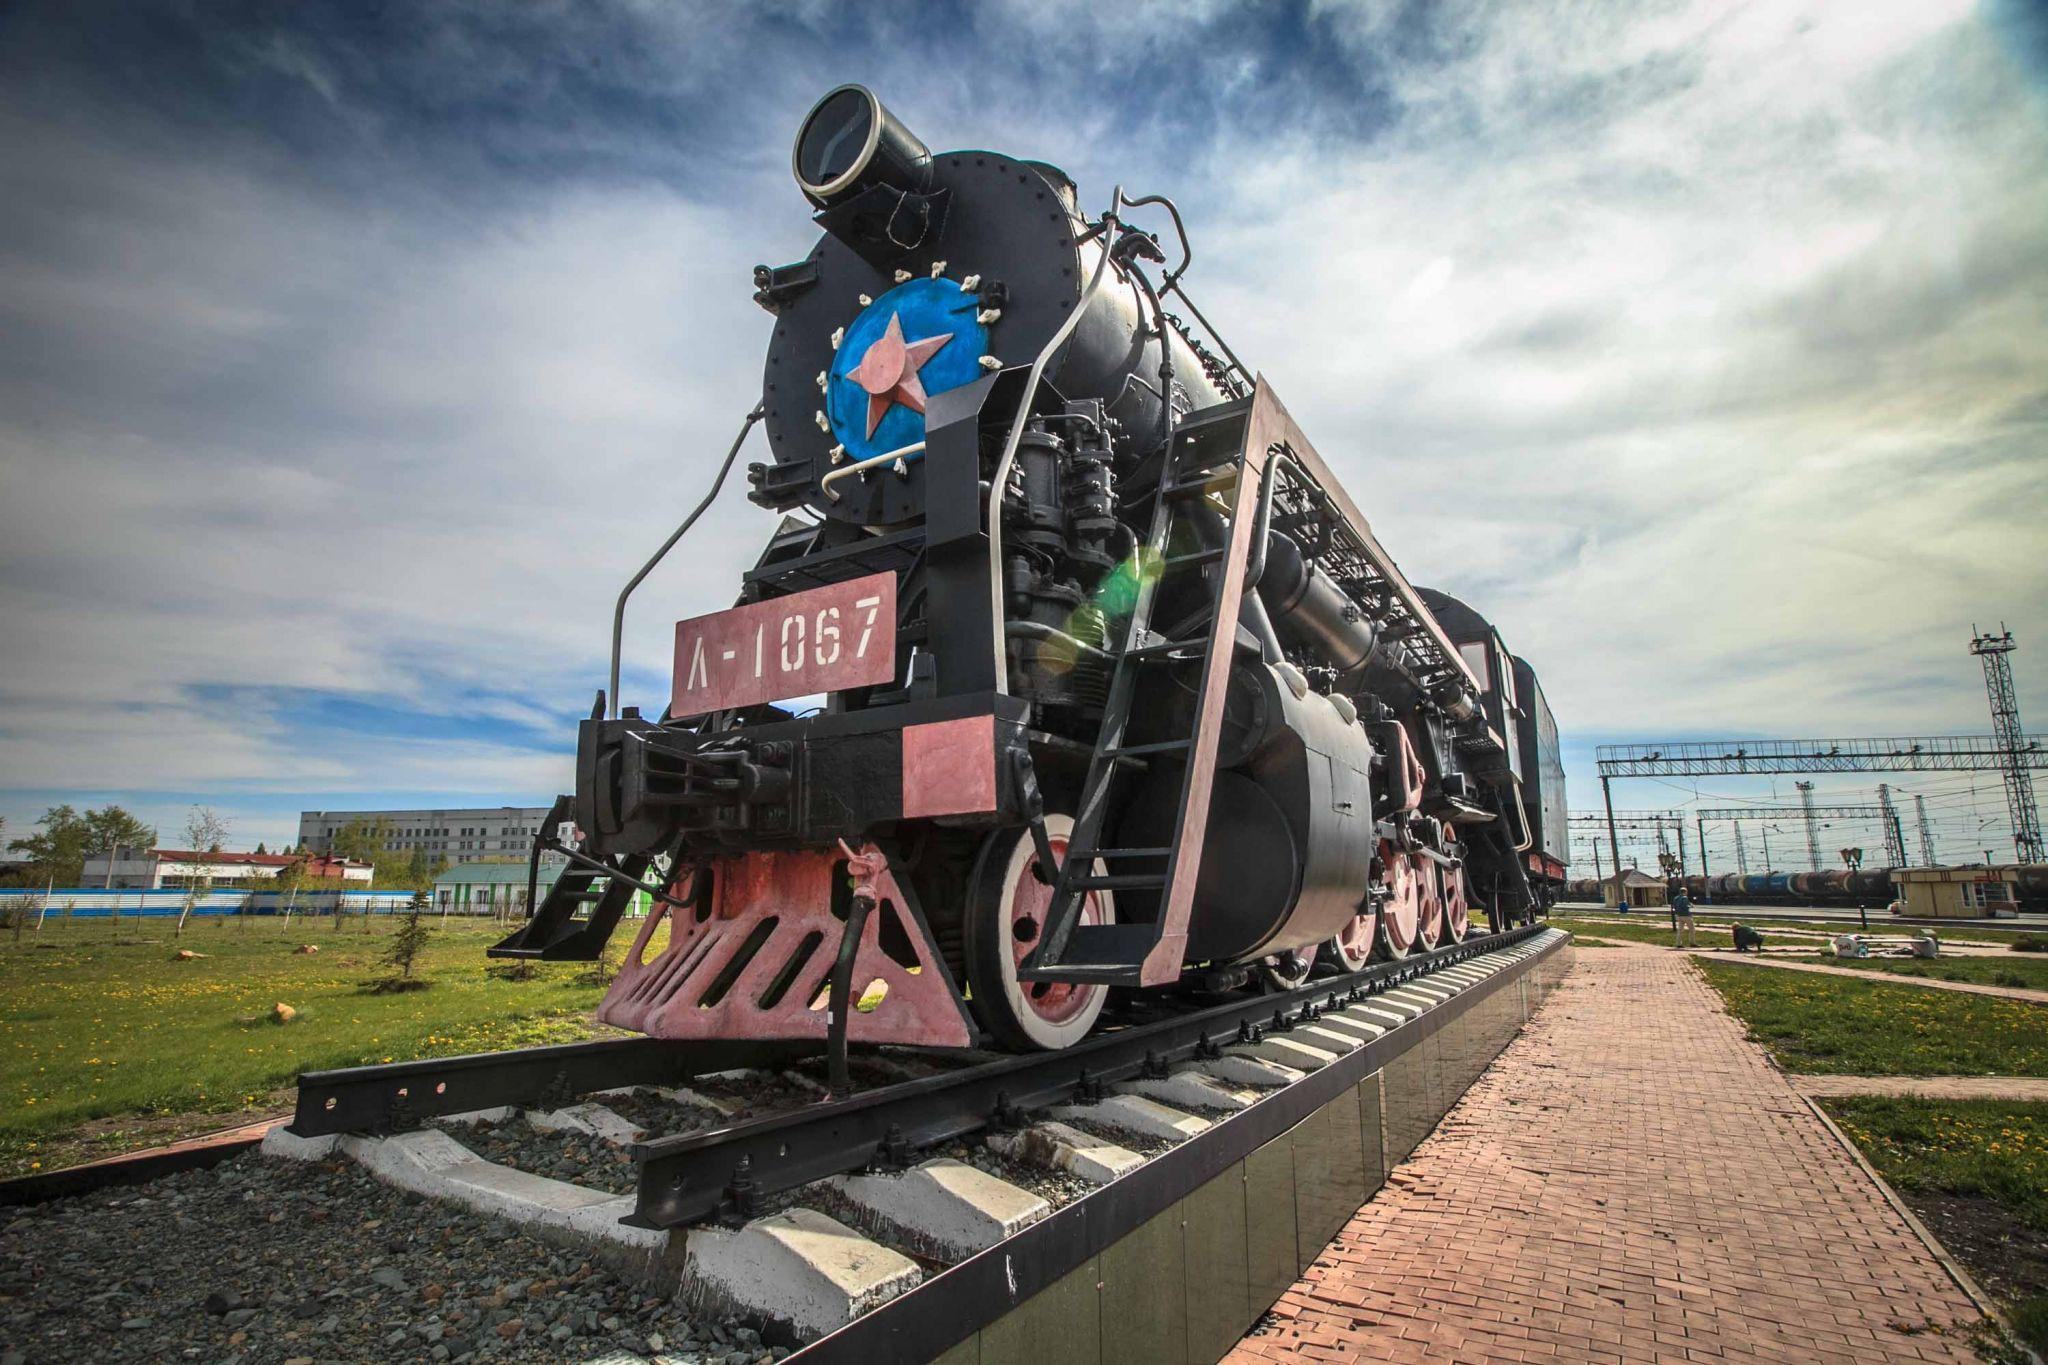 Yekaterinburg Old Train, Russian Federation